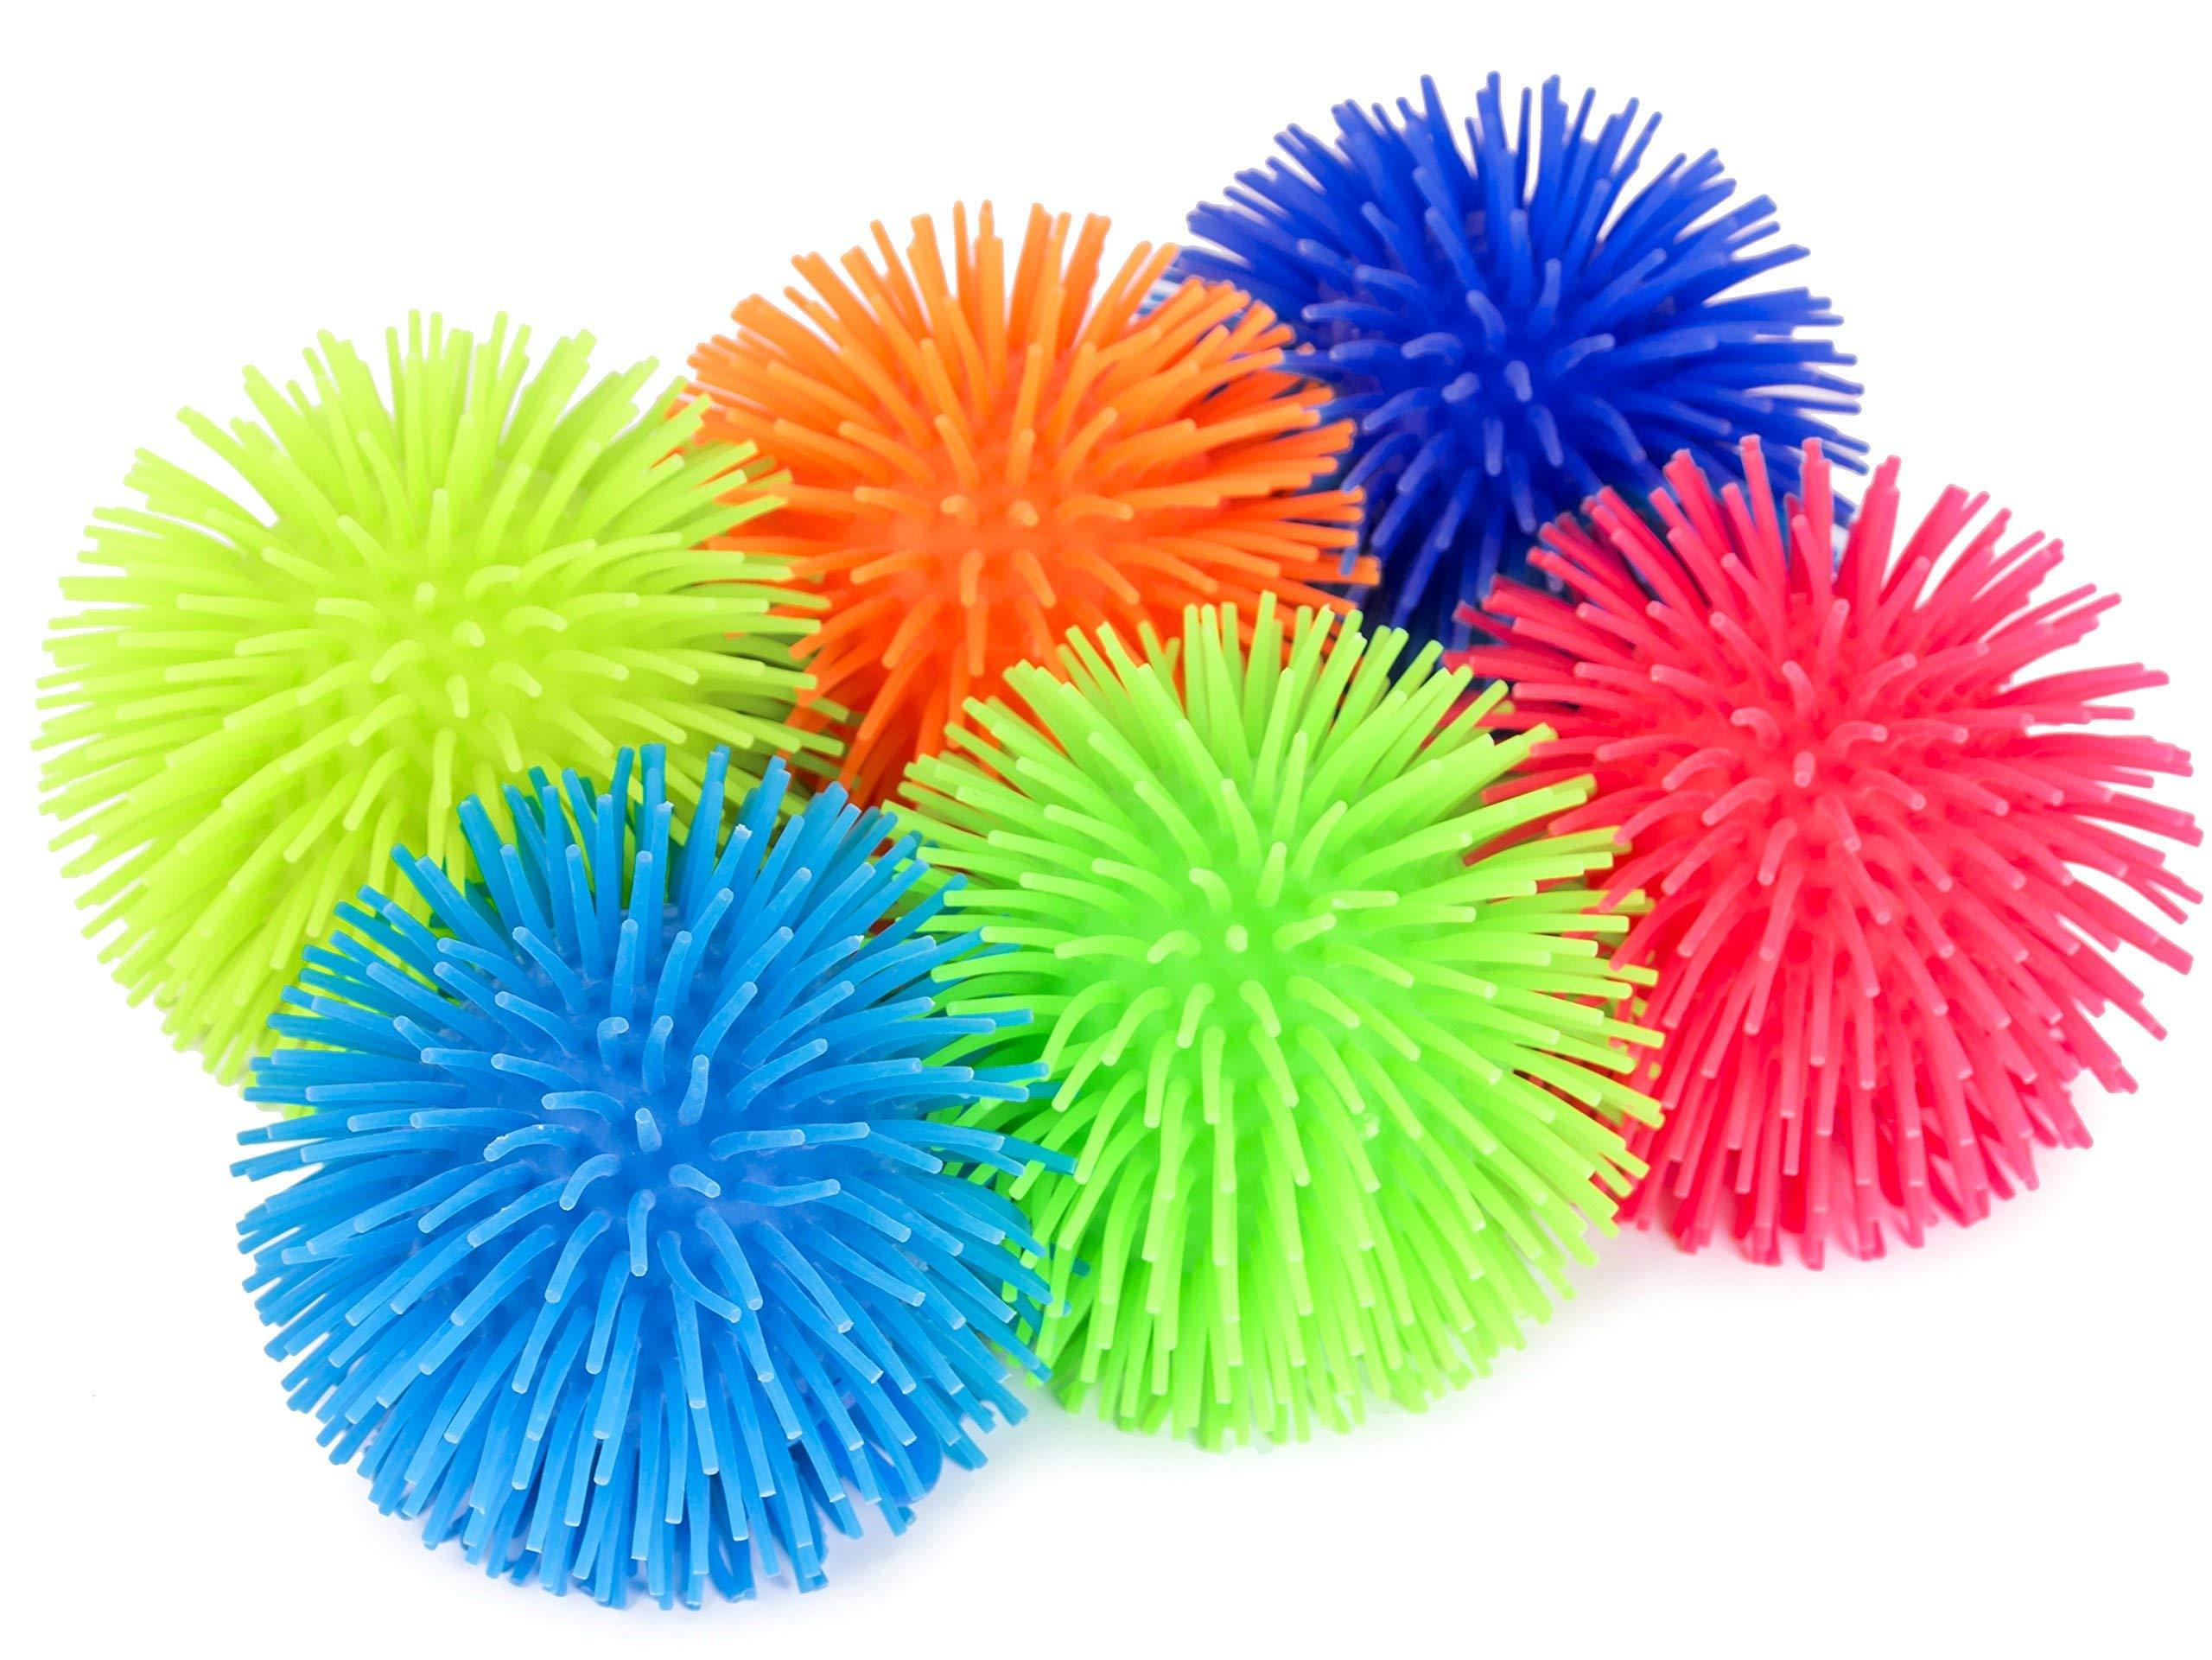 KELZ KIDZ Premium Quality Large & Thick Puffer Balls for Fun Kids Party (Set of 12) by KELZ KIDZ (Image #2)